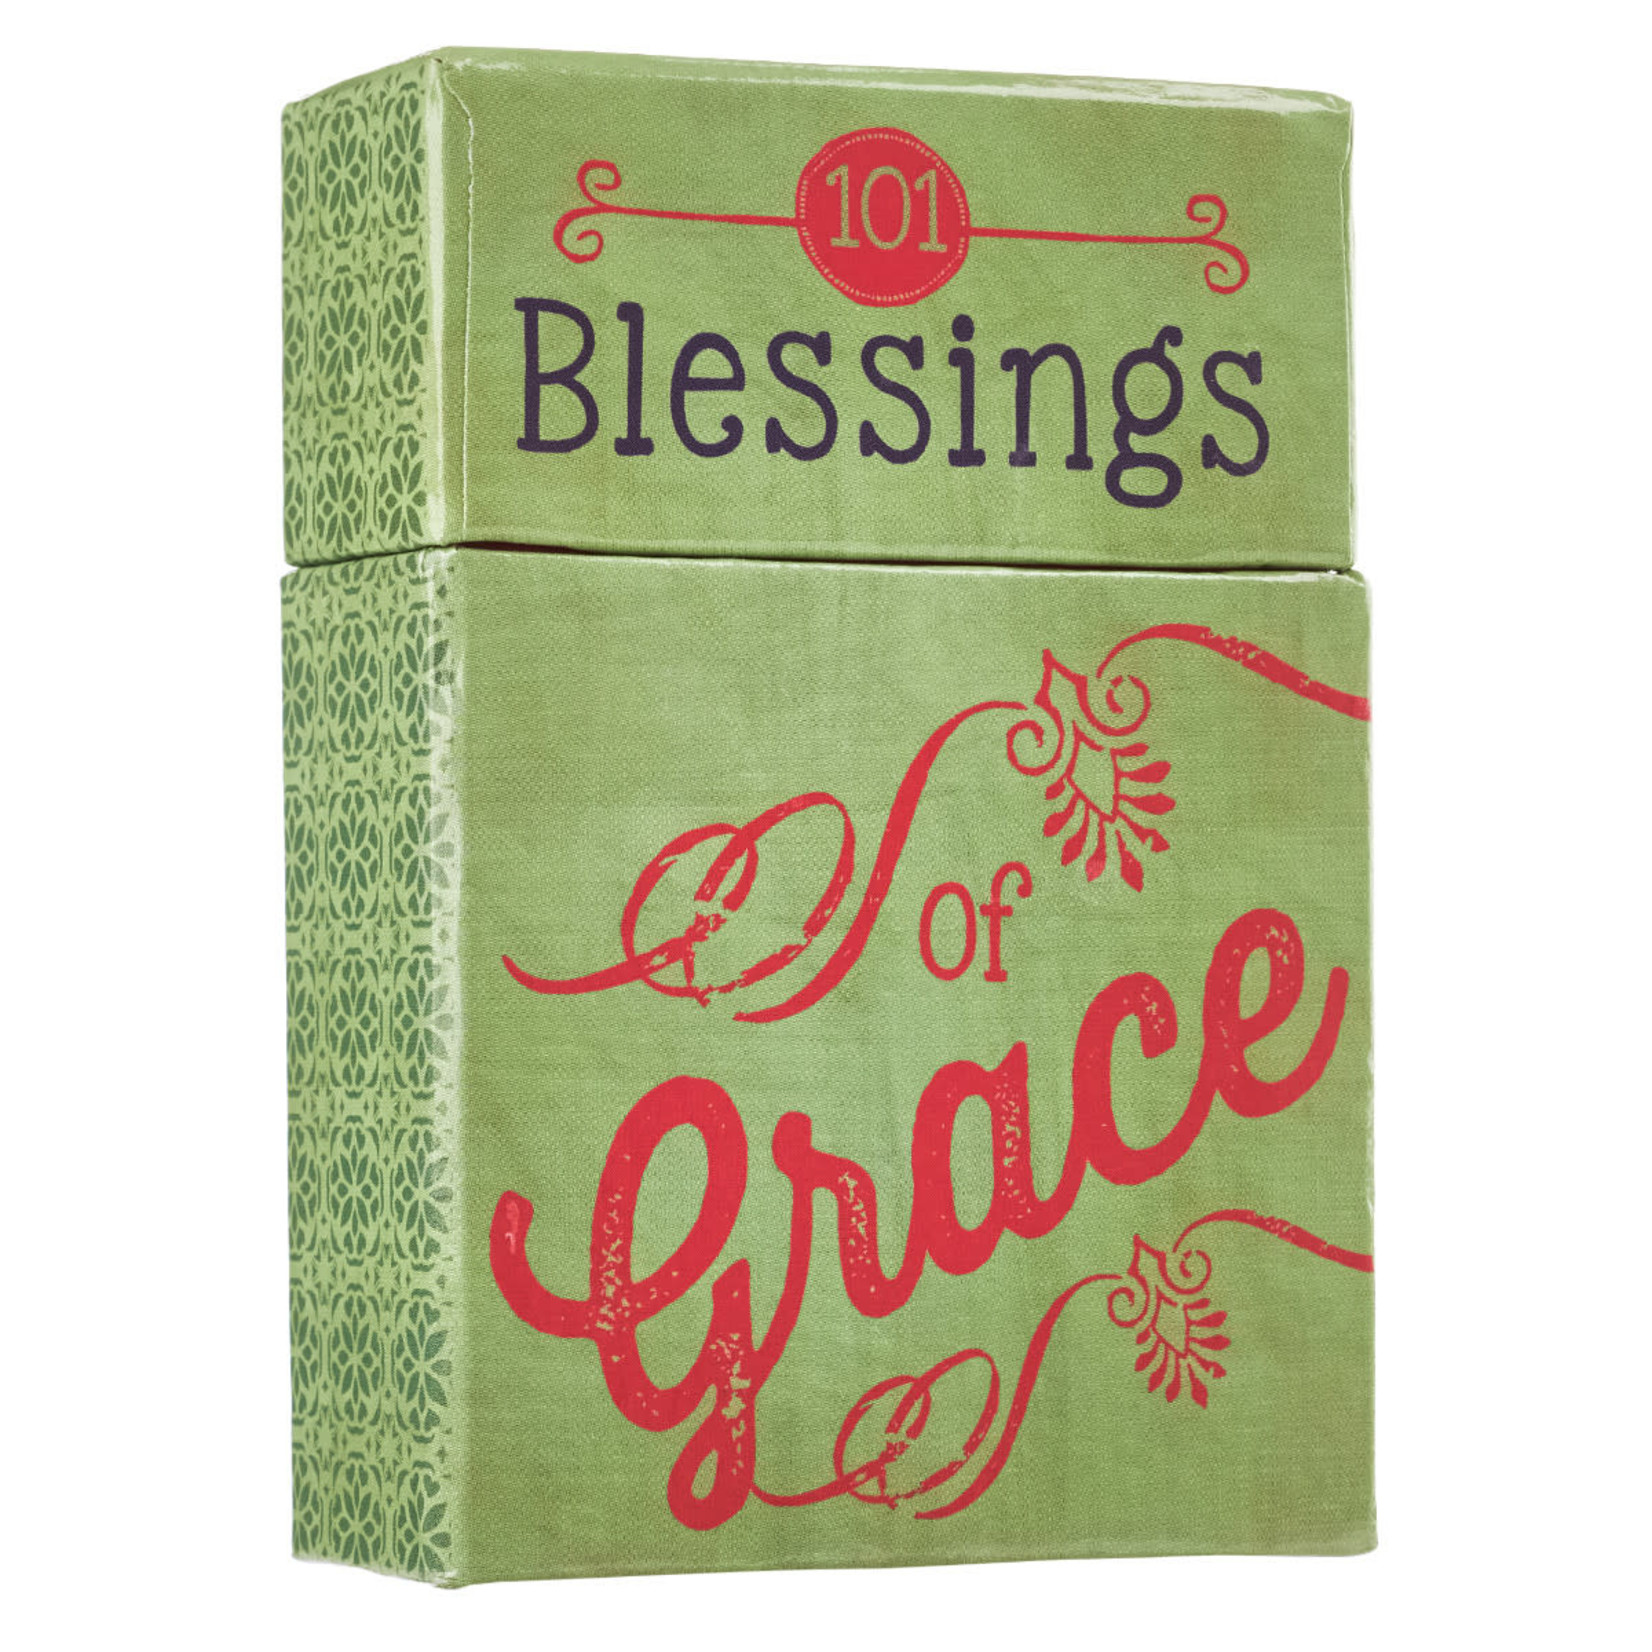 Christian Art Gifts 101 Blessings of Grace - Box of Blessings